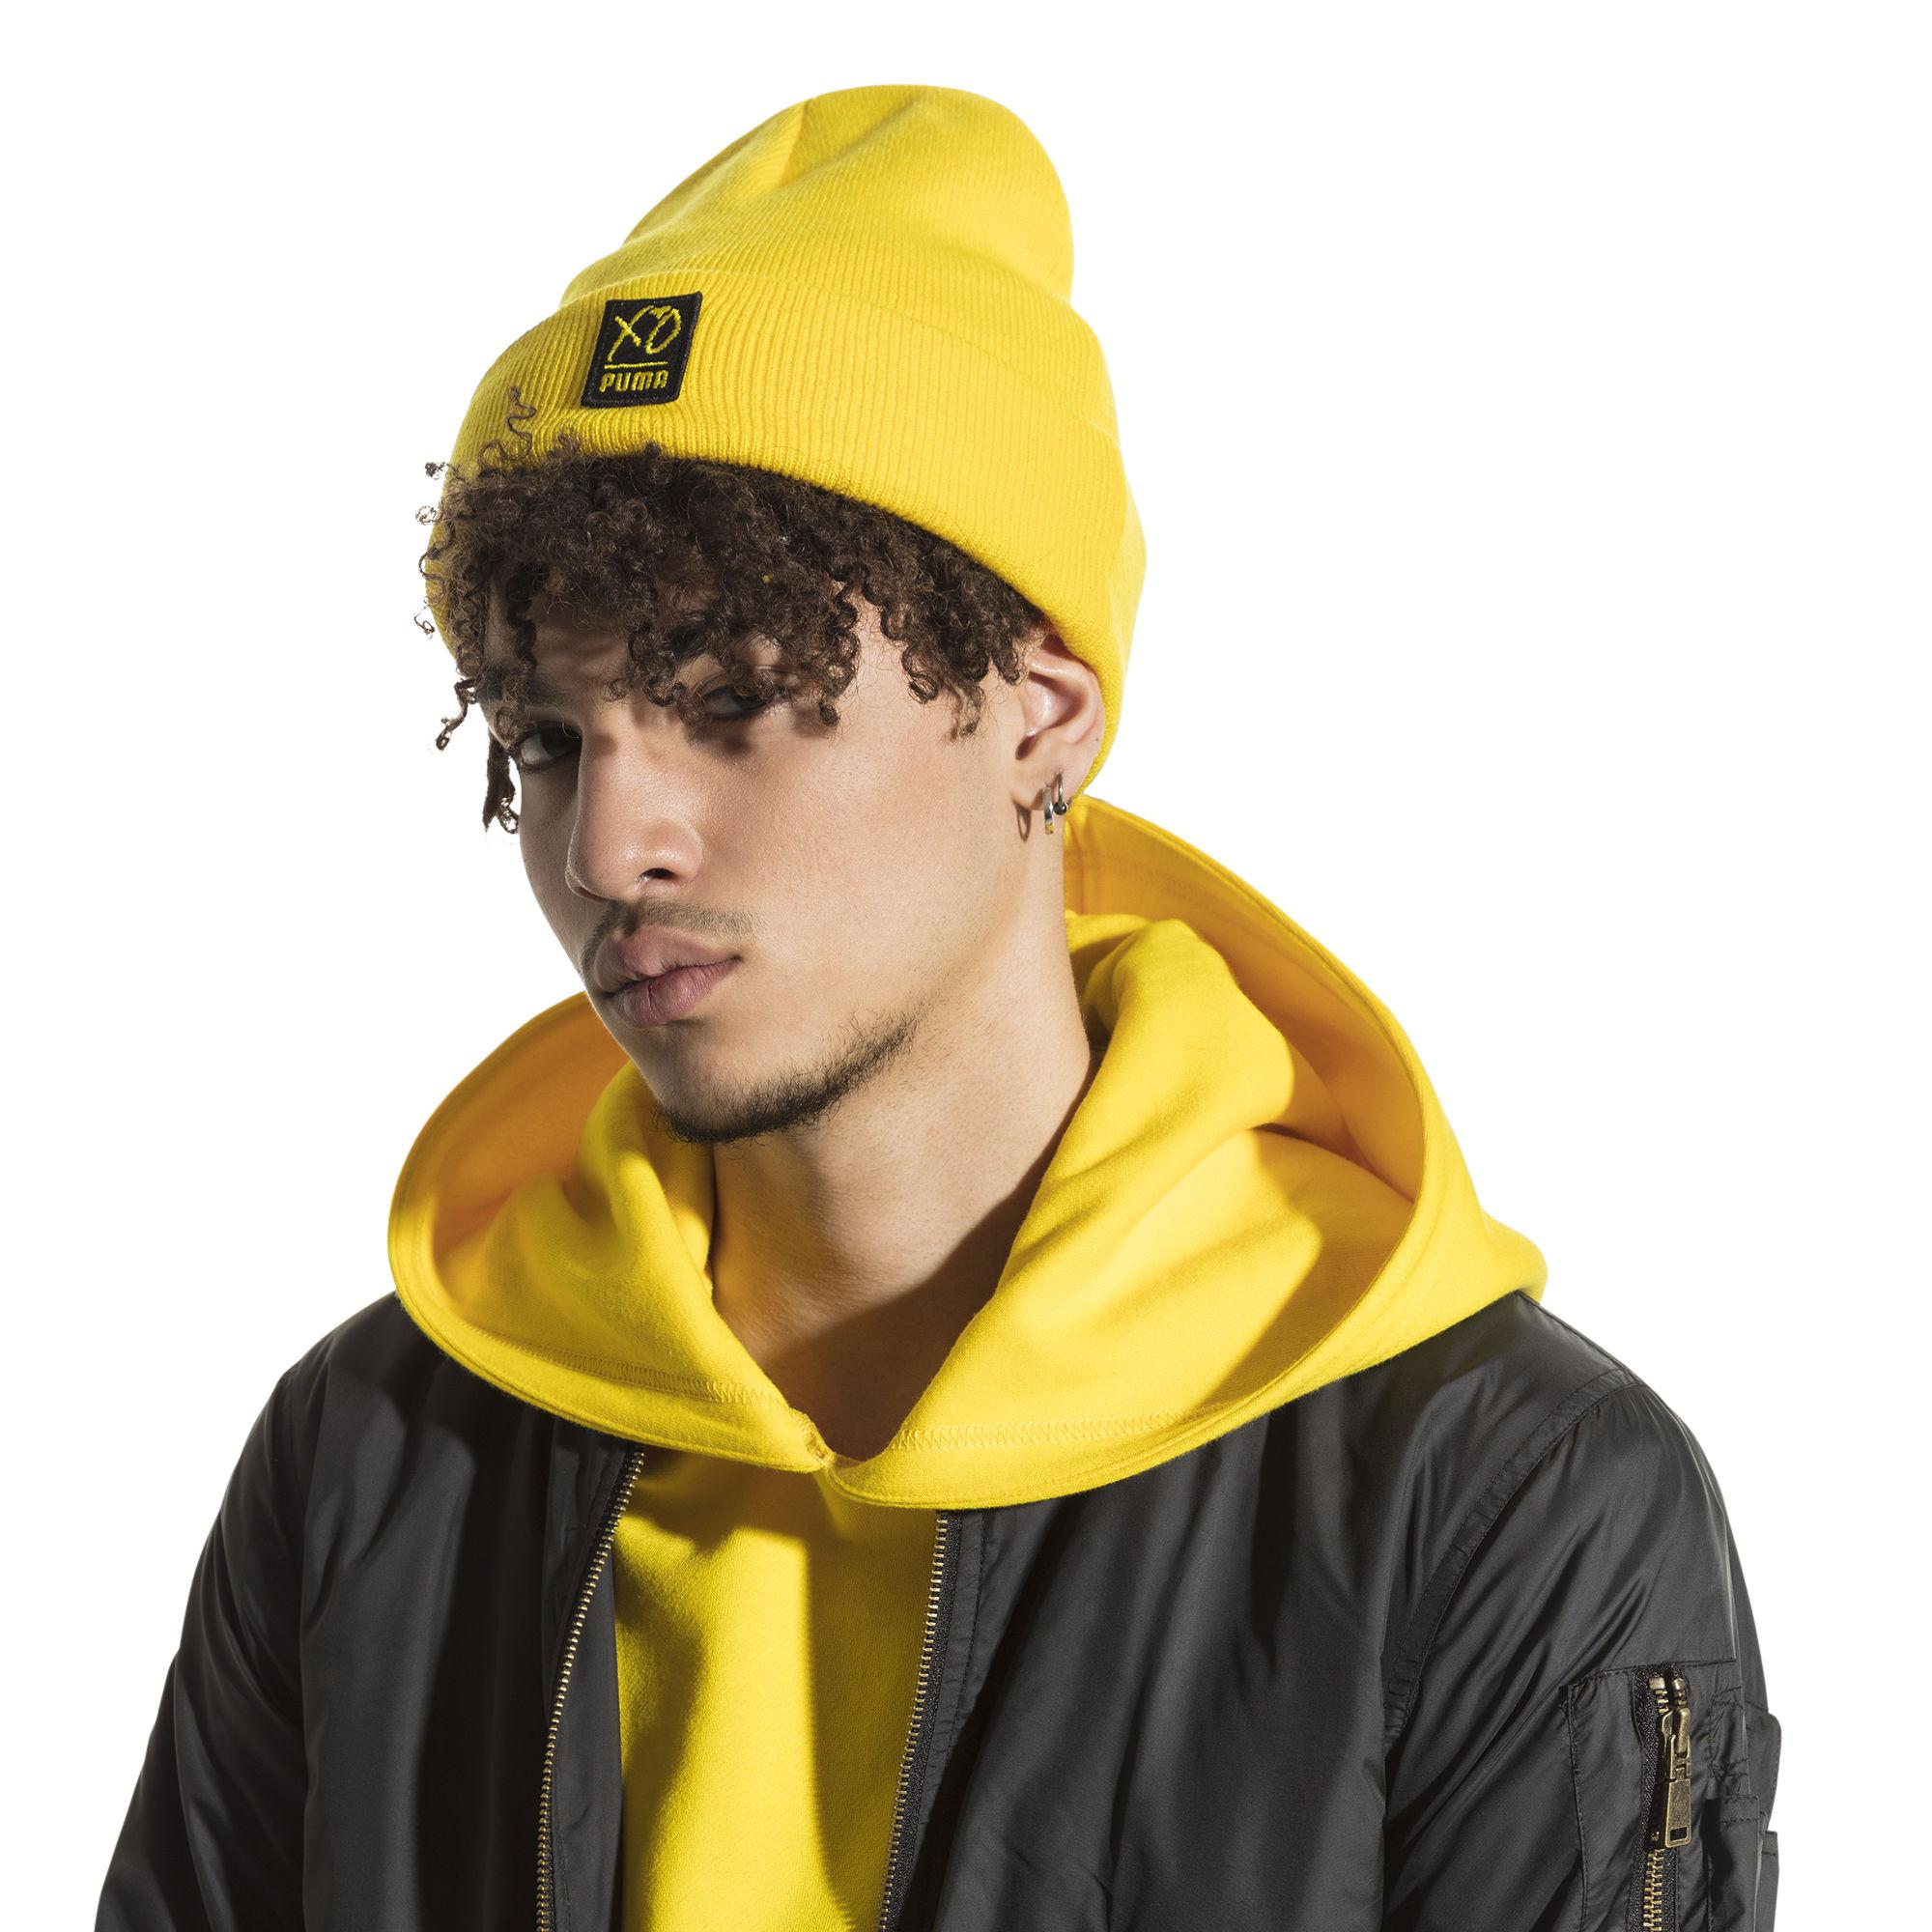 a6c4dba1c4a Lyst - PUMA X Xo Beanie in Yellow for Men